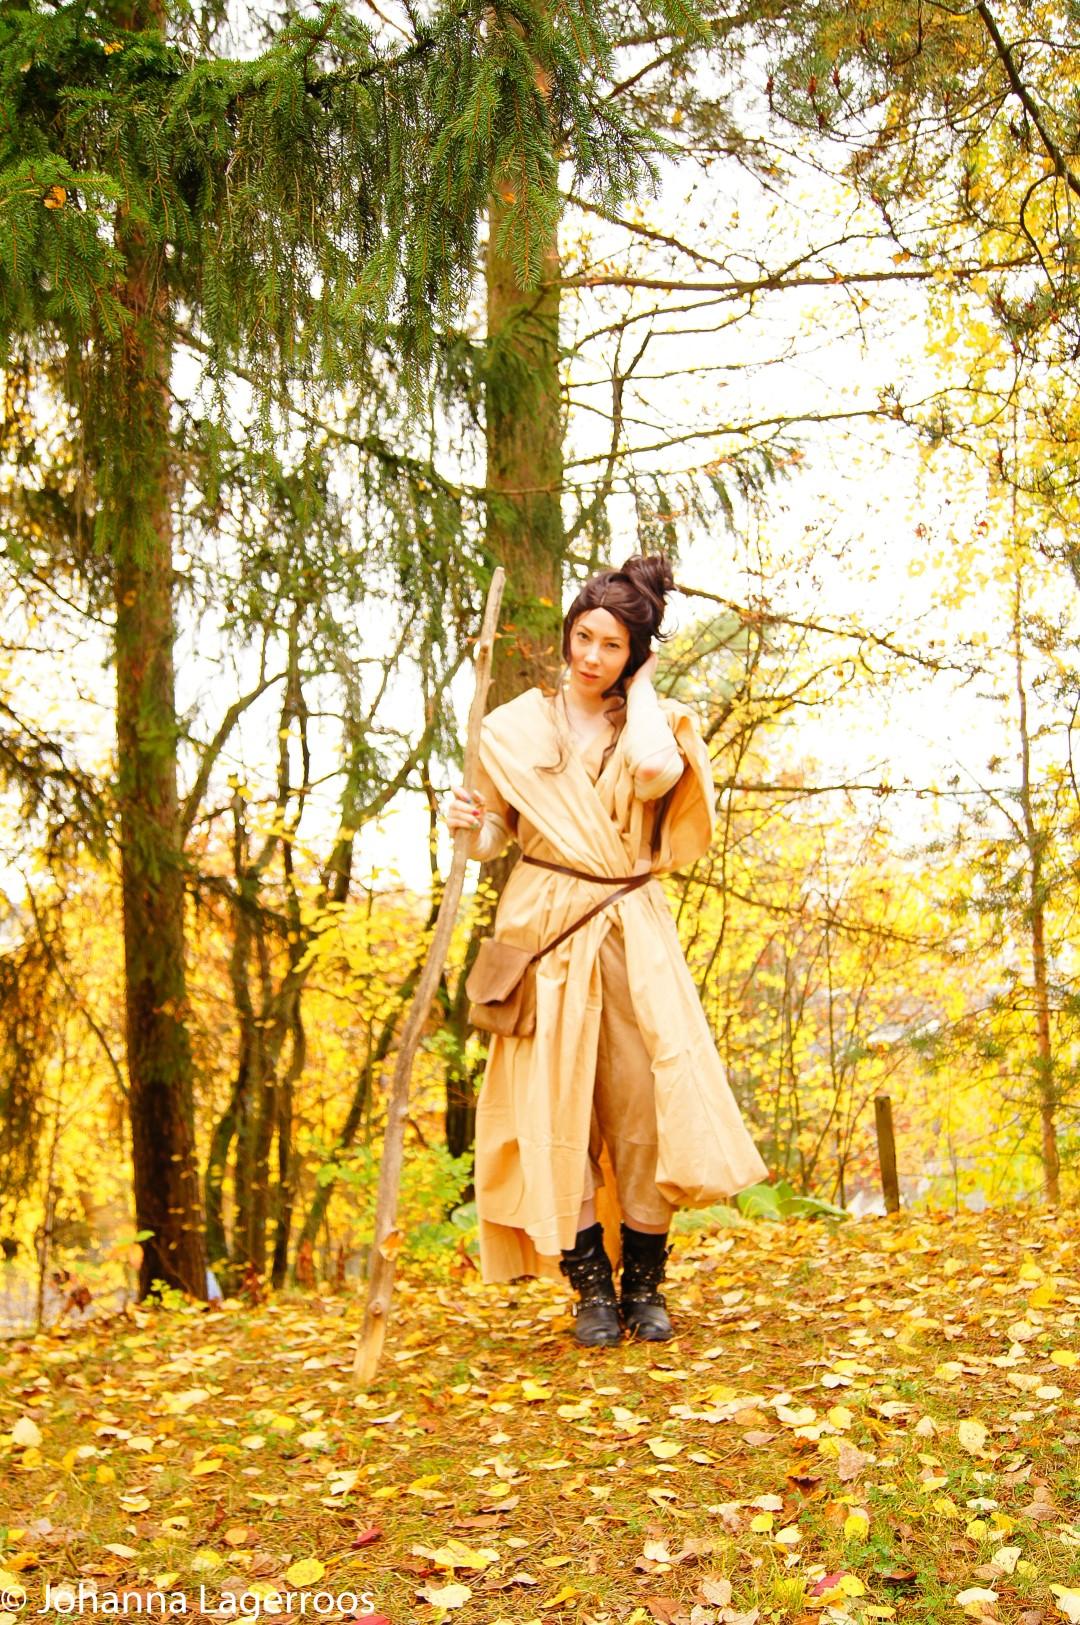 Rey isnpired costume